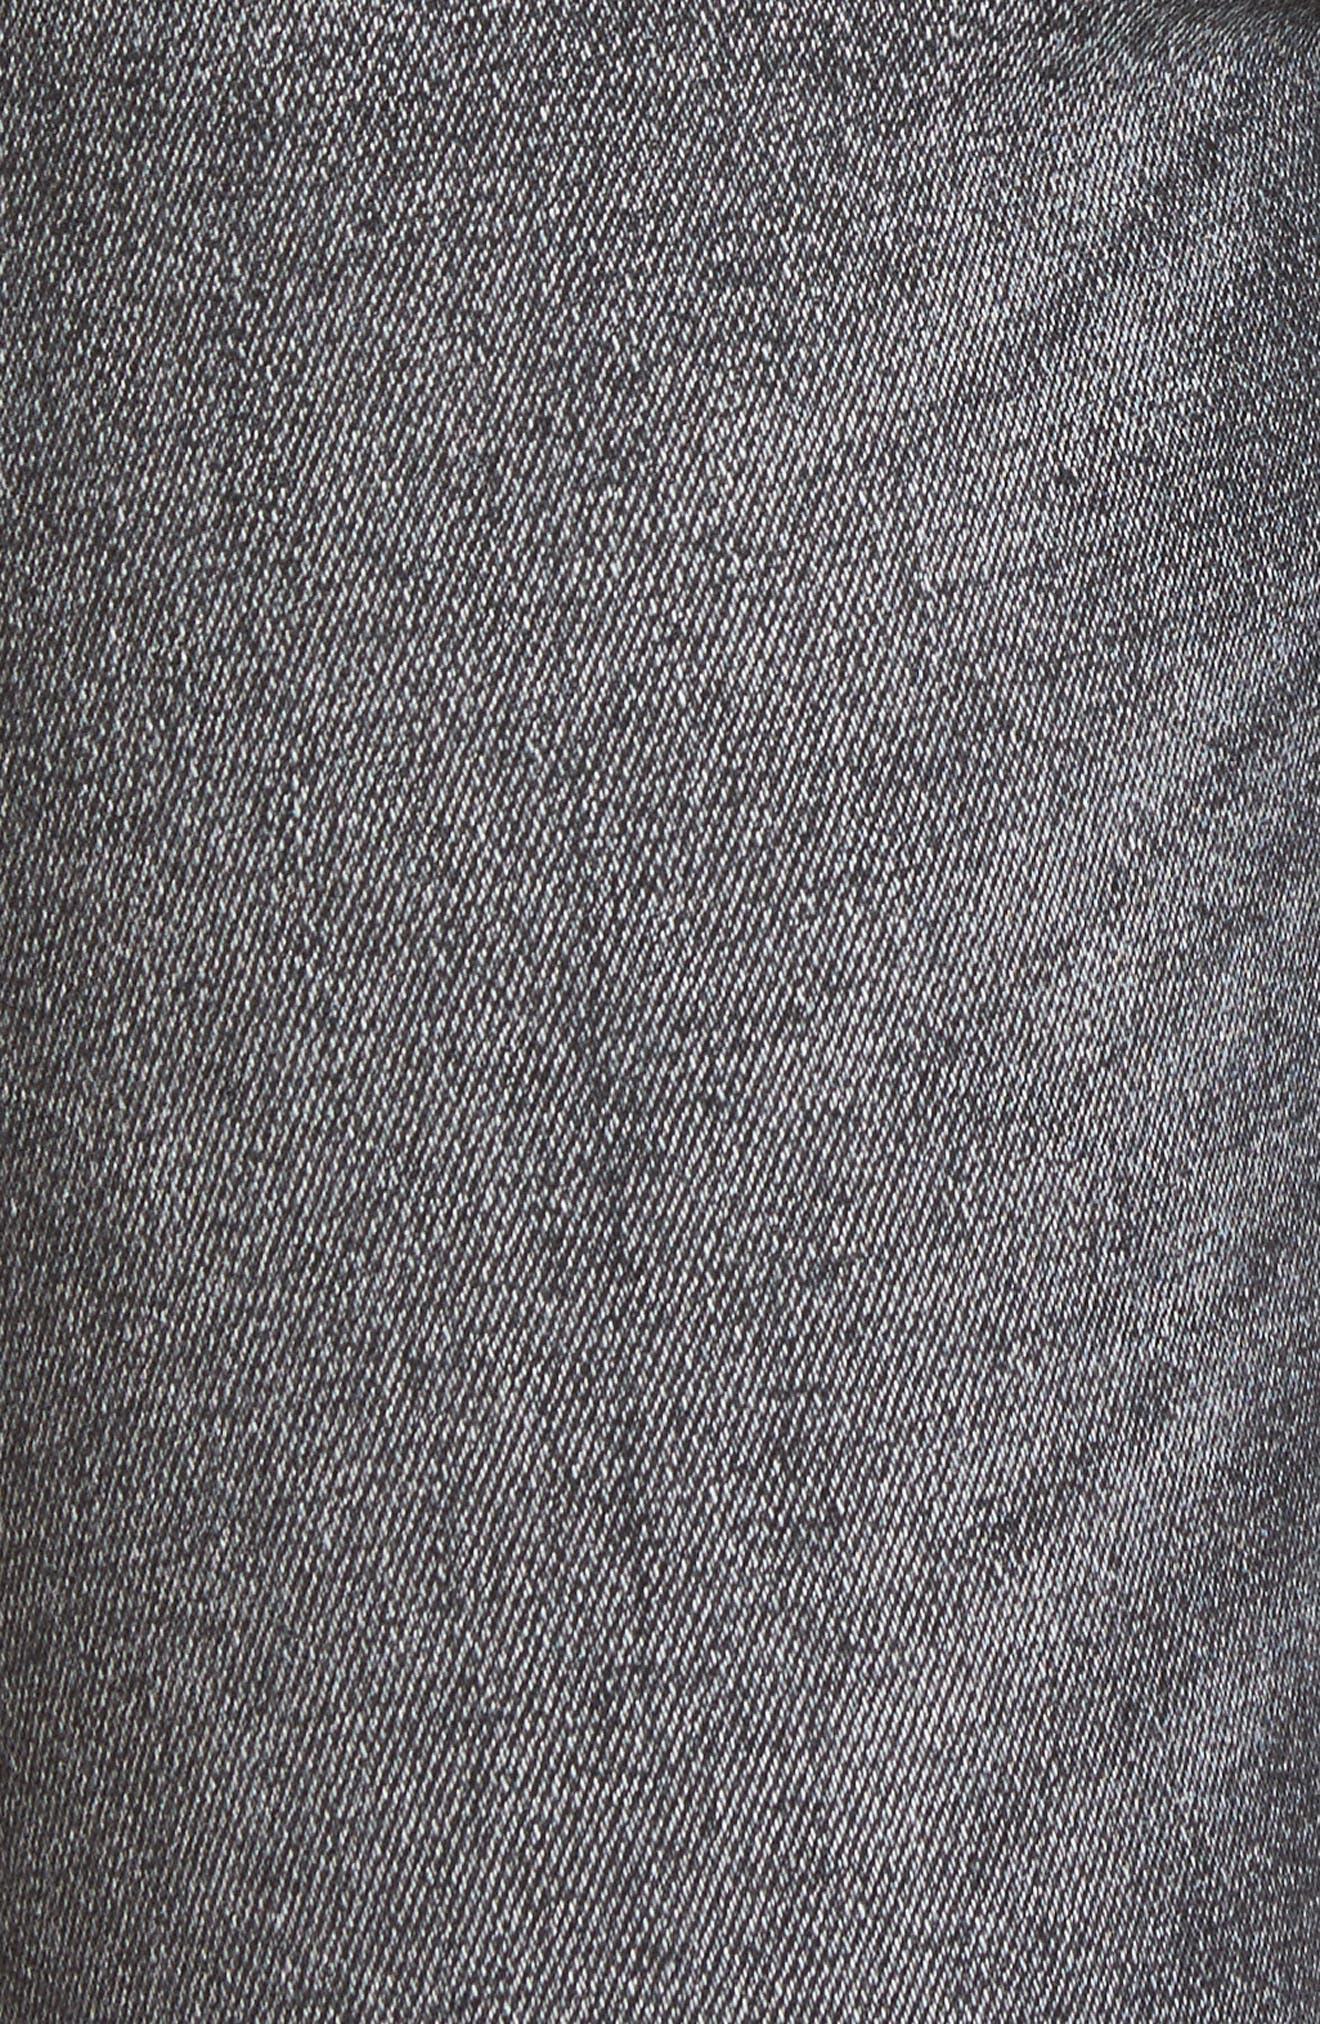 Farrow Ripped Ankle Jeans,                             Alternate thumbnail 6, color,                             LIGHT SMOKE